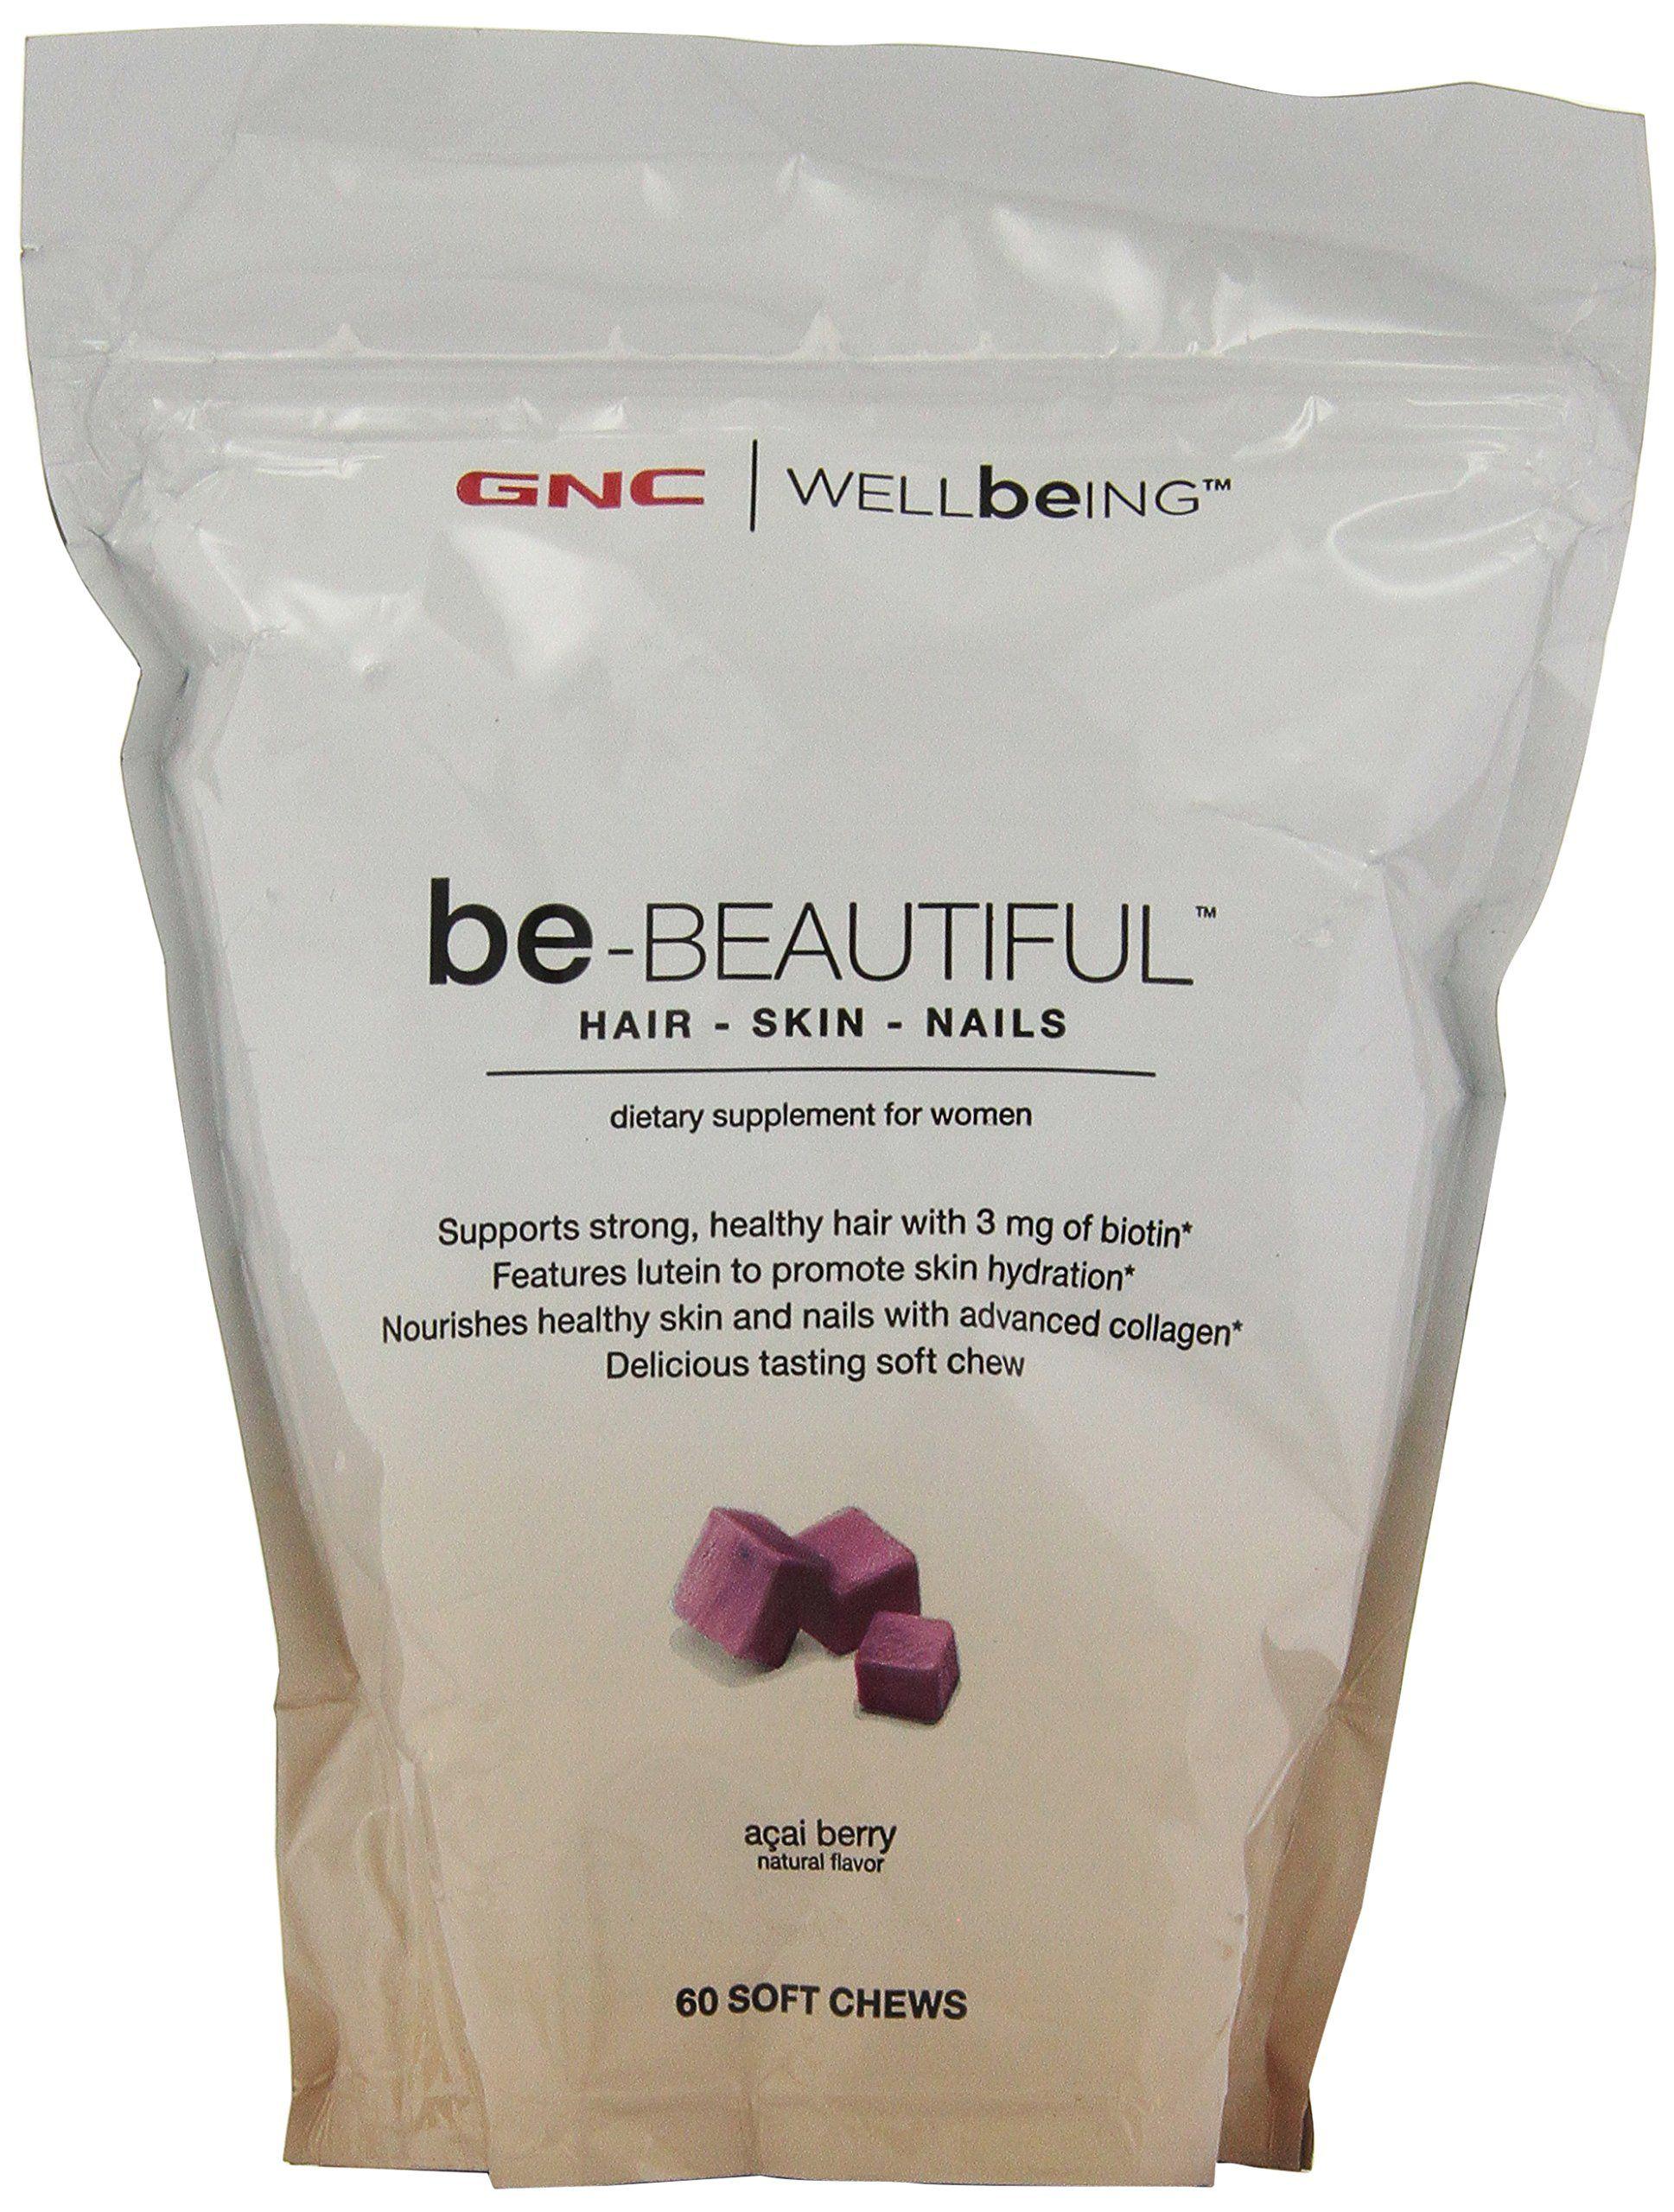 GNC Wellbeing Be-beautiful Hair-skin-nails 60 Soft Chews Acai Berry ...